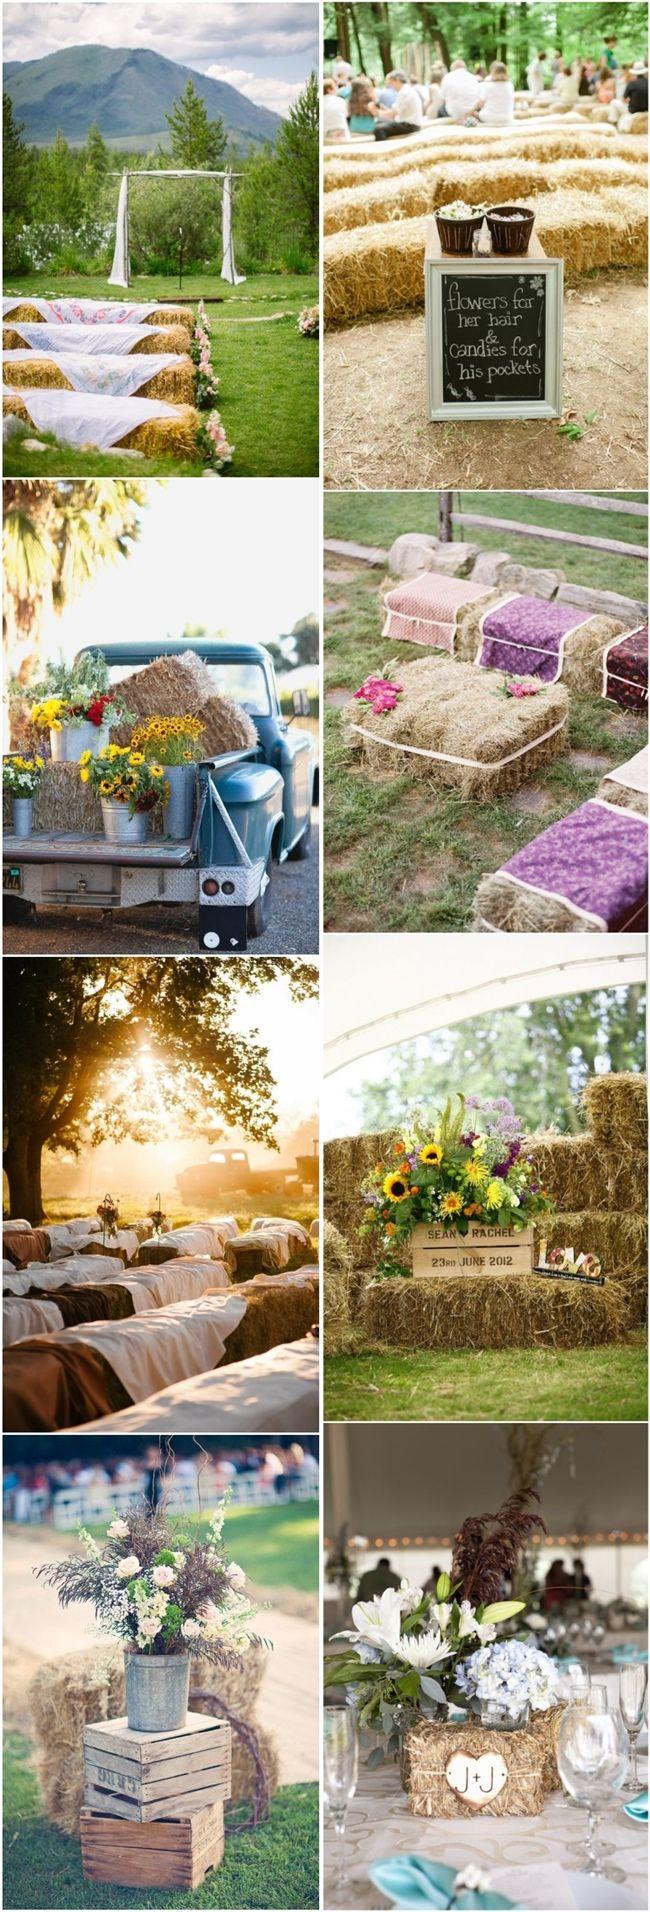 rustic country wedding ideas- hay bales wedding decors / http://www.deerpearlflowers.com/30-ways-to-use-hay-bales-at-your-country-wedding/